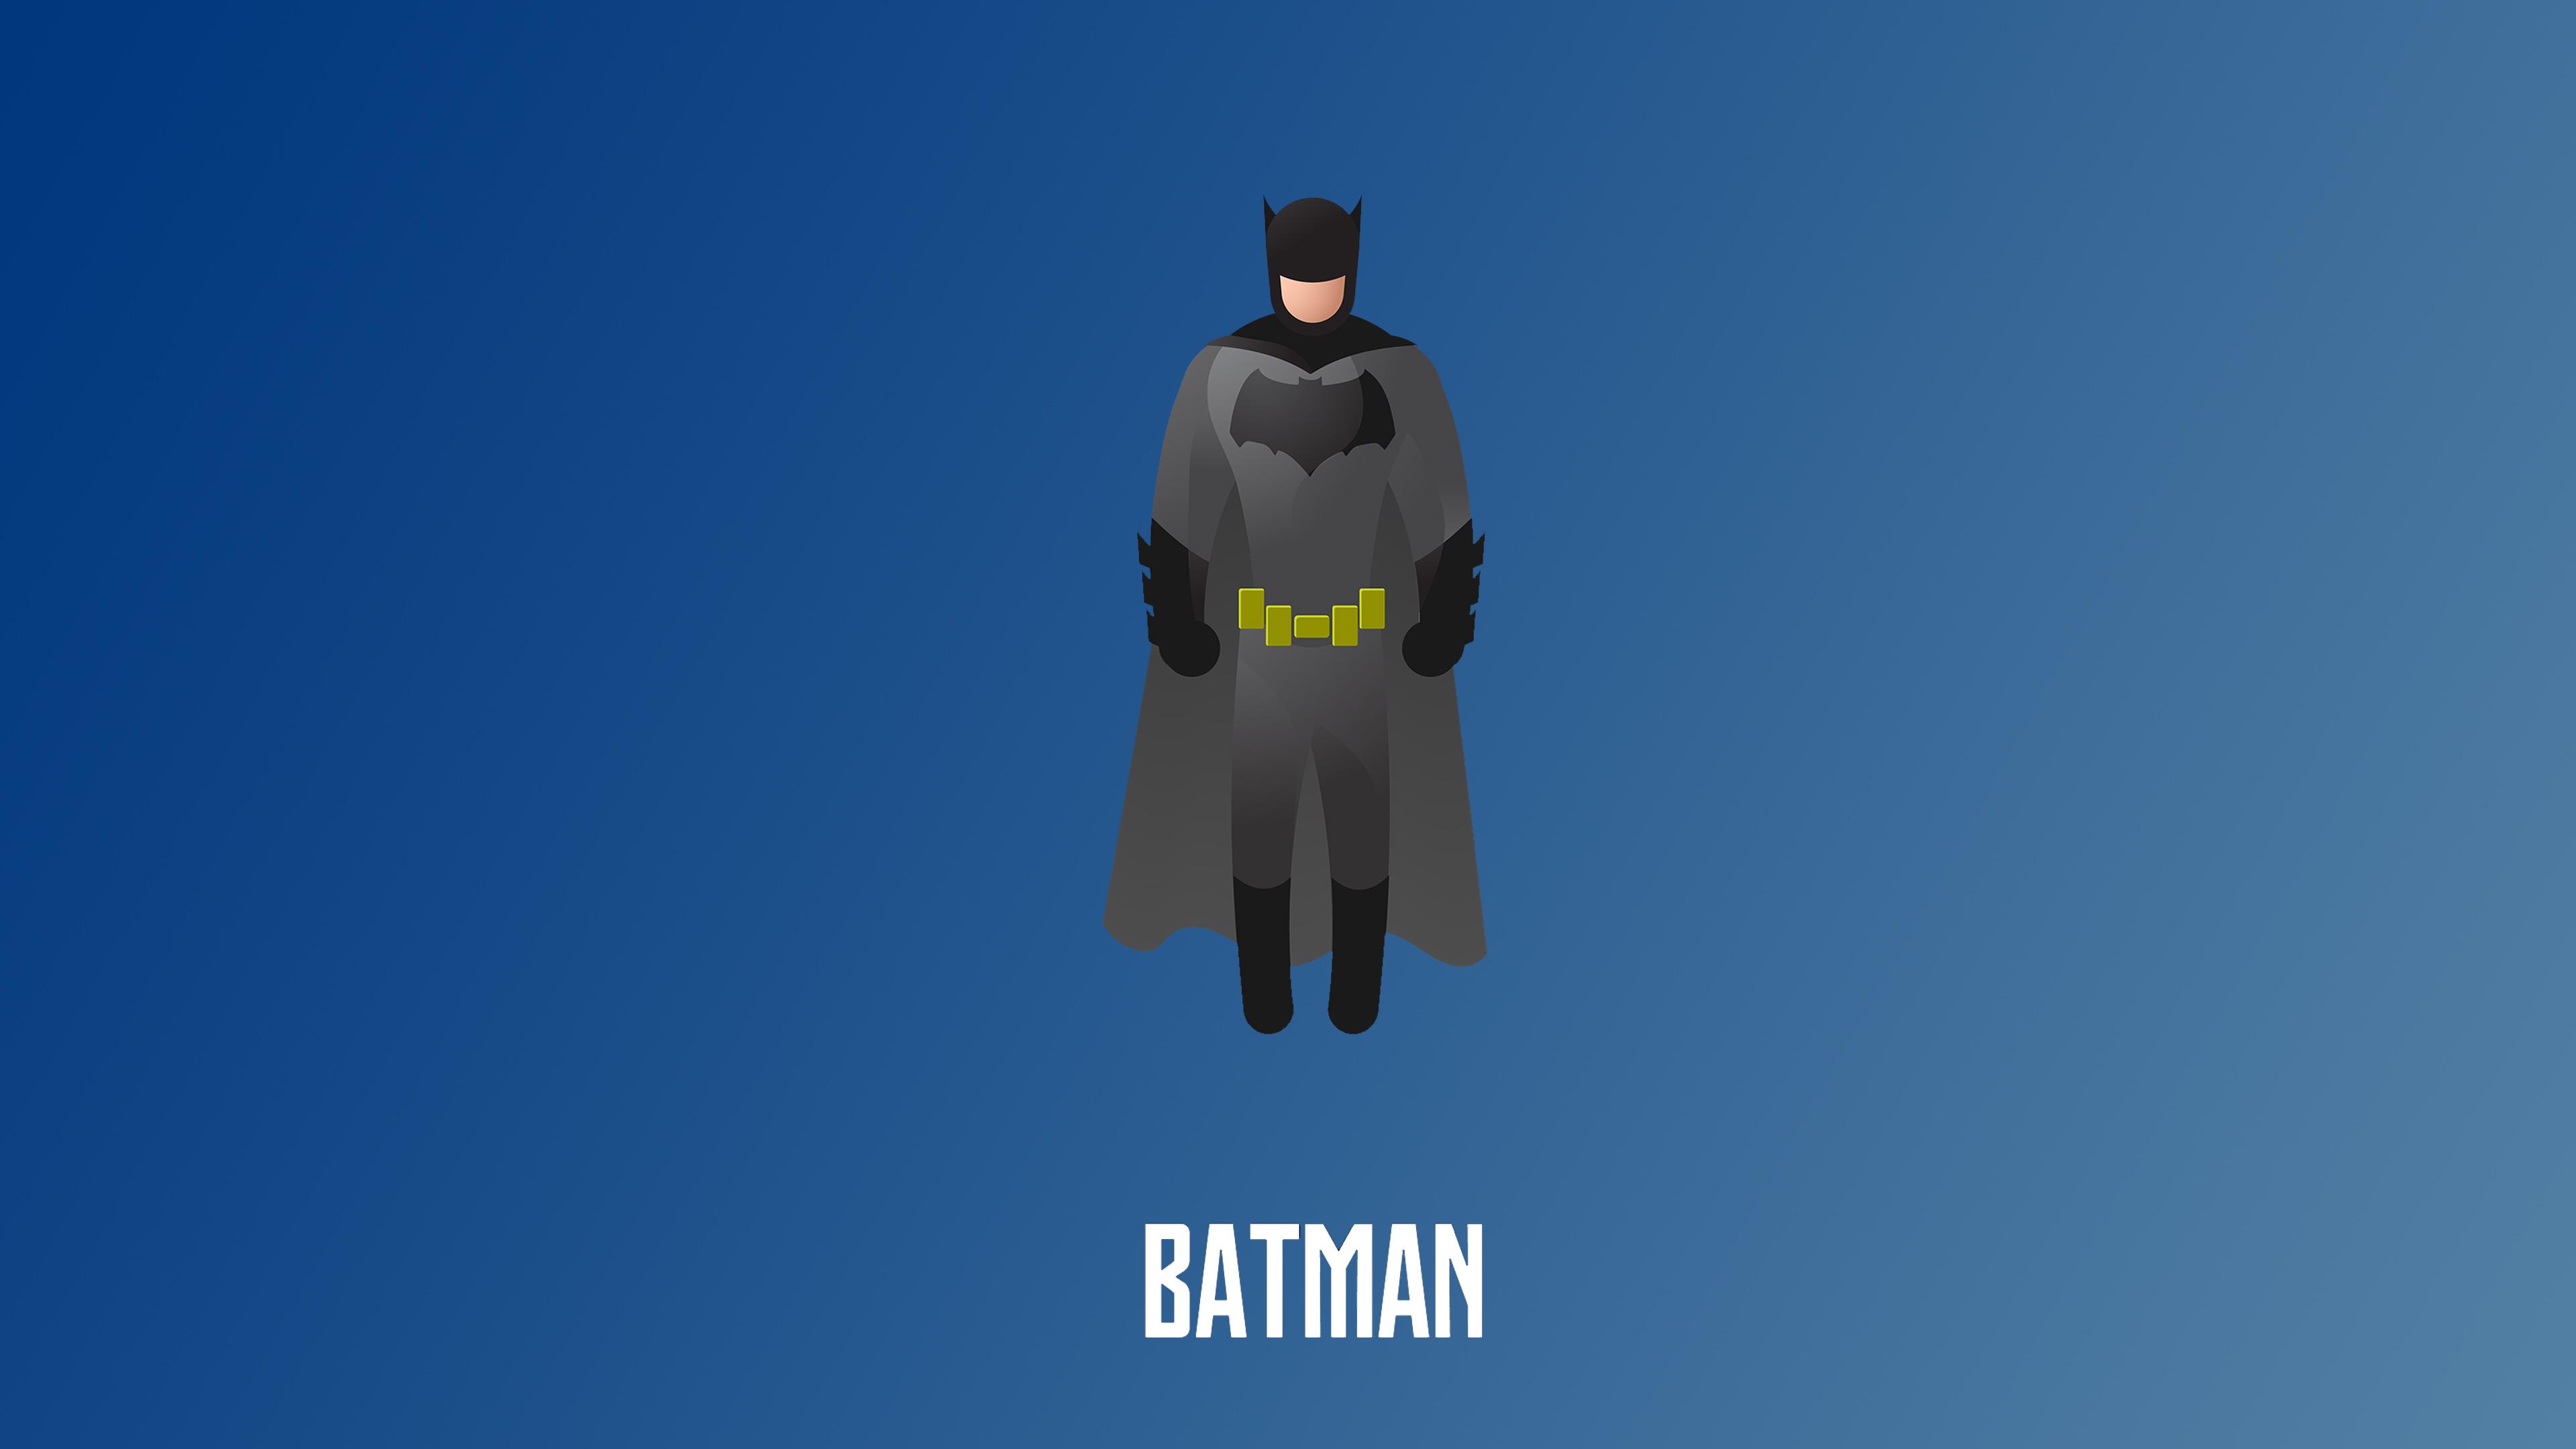 Batman Illustration 4k Hd Superheroes 4k Wallpapers Images